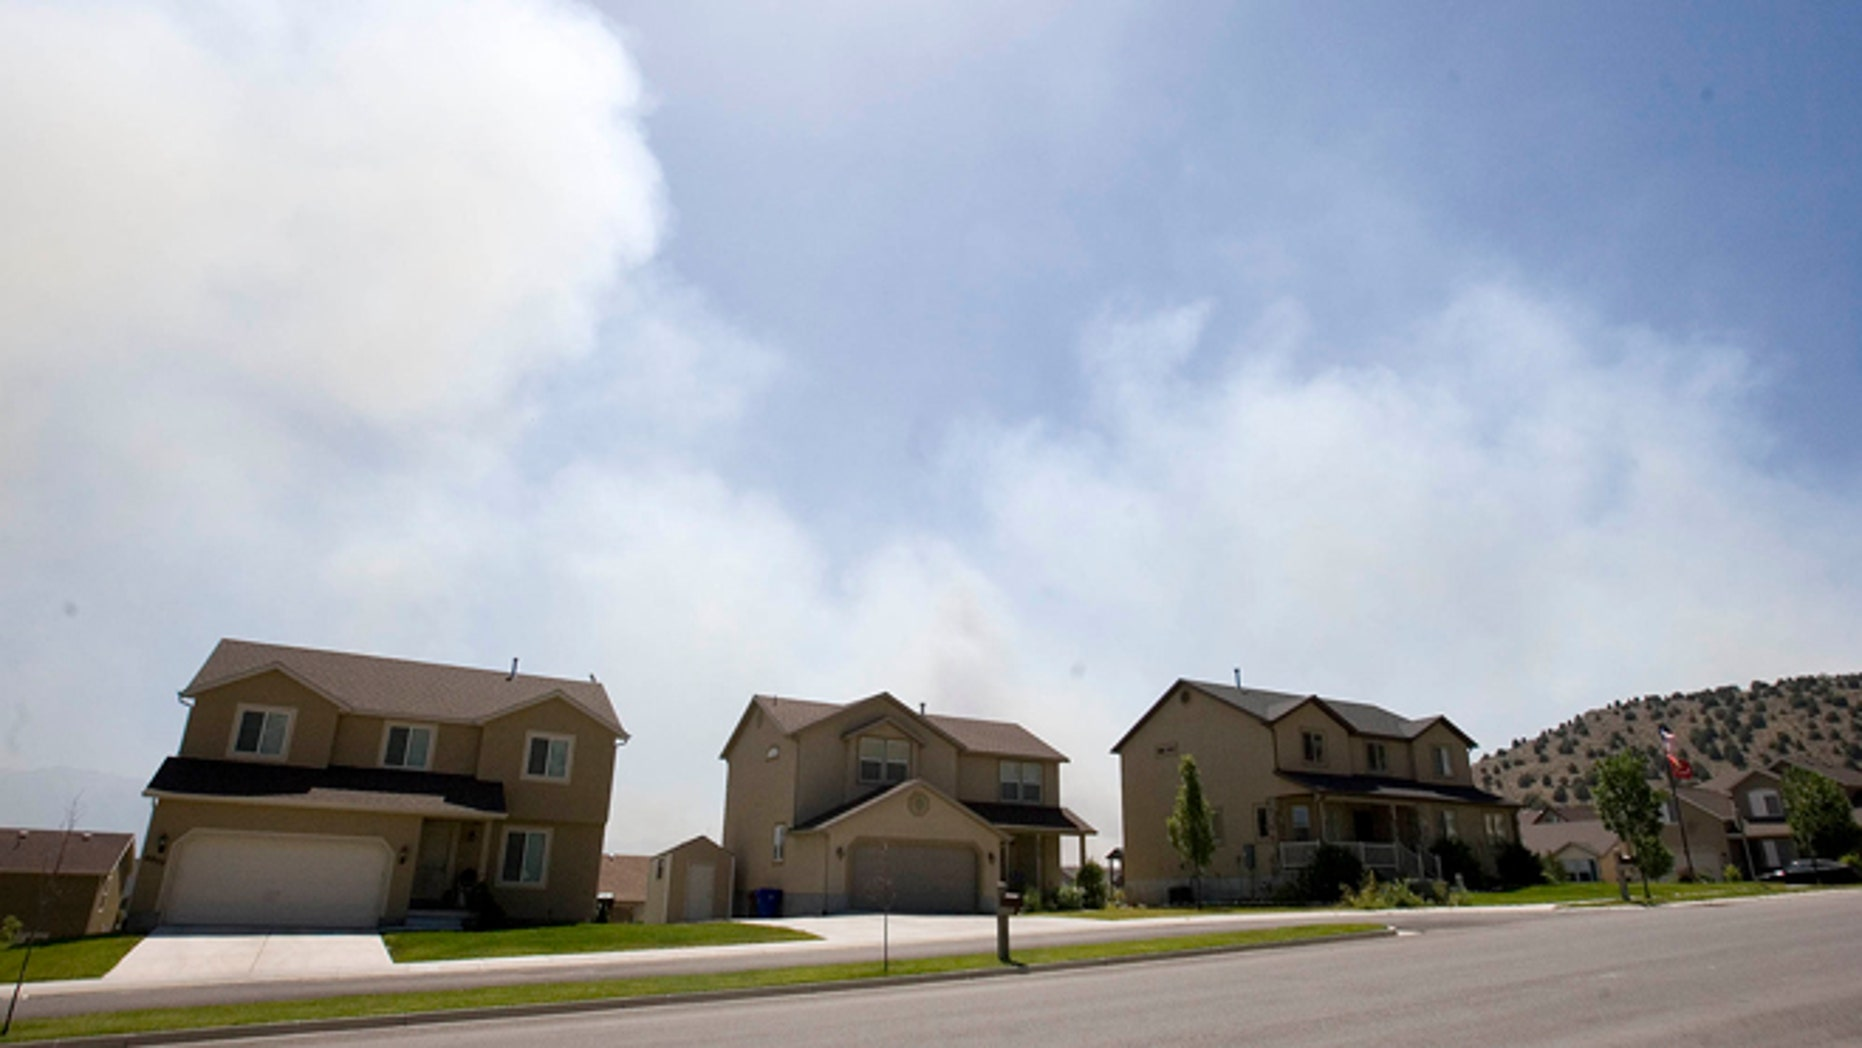 June 22, 2012: Smoke fills the sky as a fire burns near Eagle Mountain, Utah.